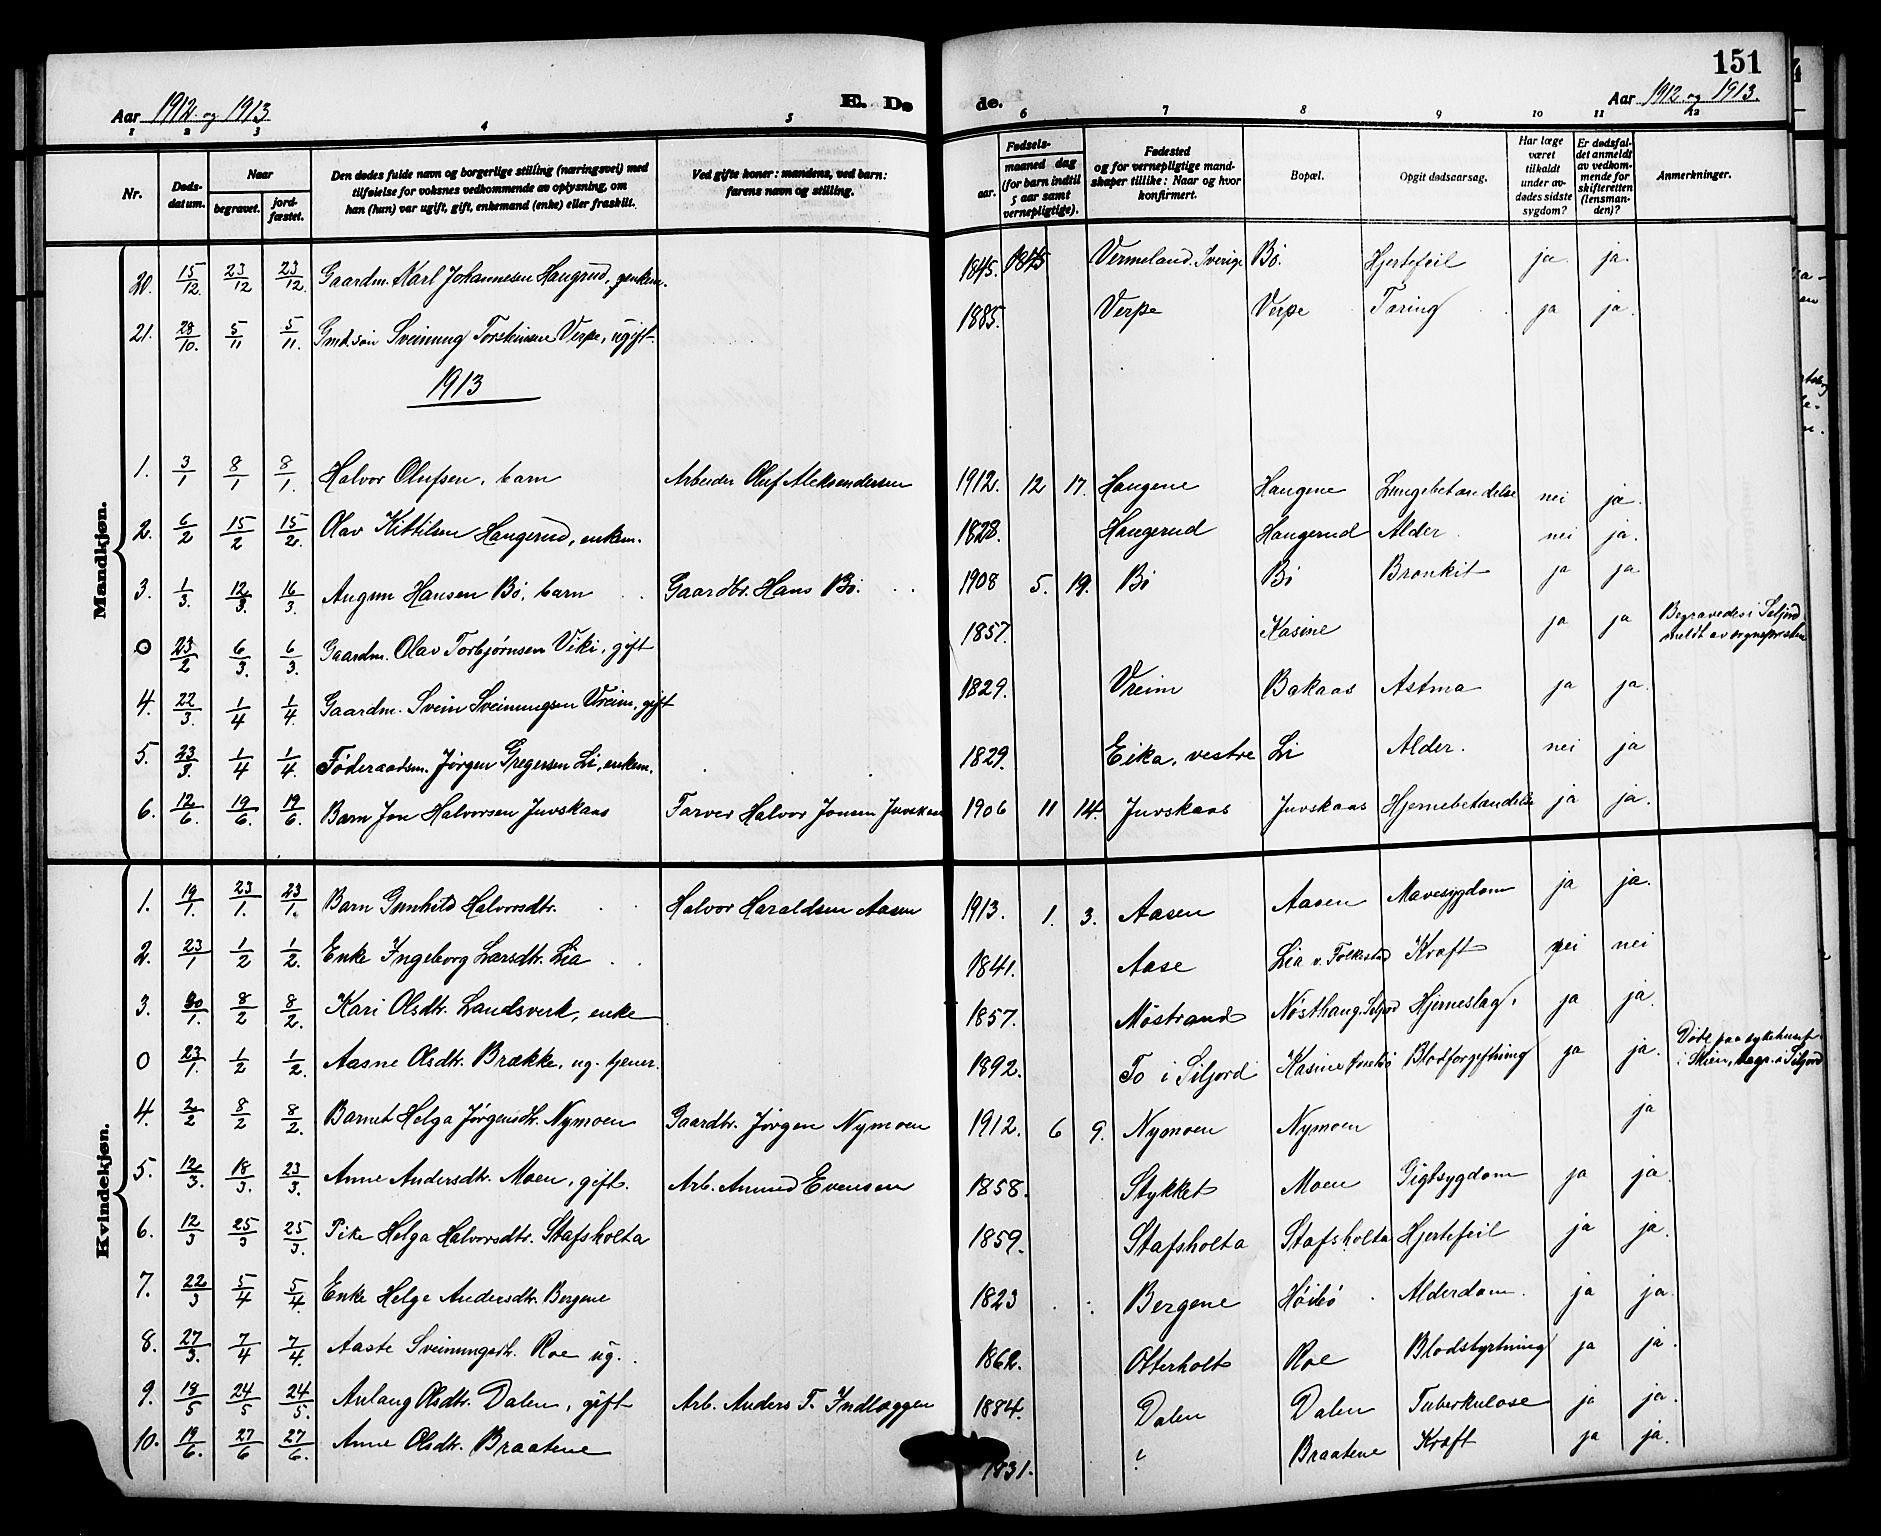 SAKO, Bø kirkebøker, G/Ga/L0007: Klokkerbok nr. 7, 1909-1924, s. 151